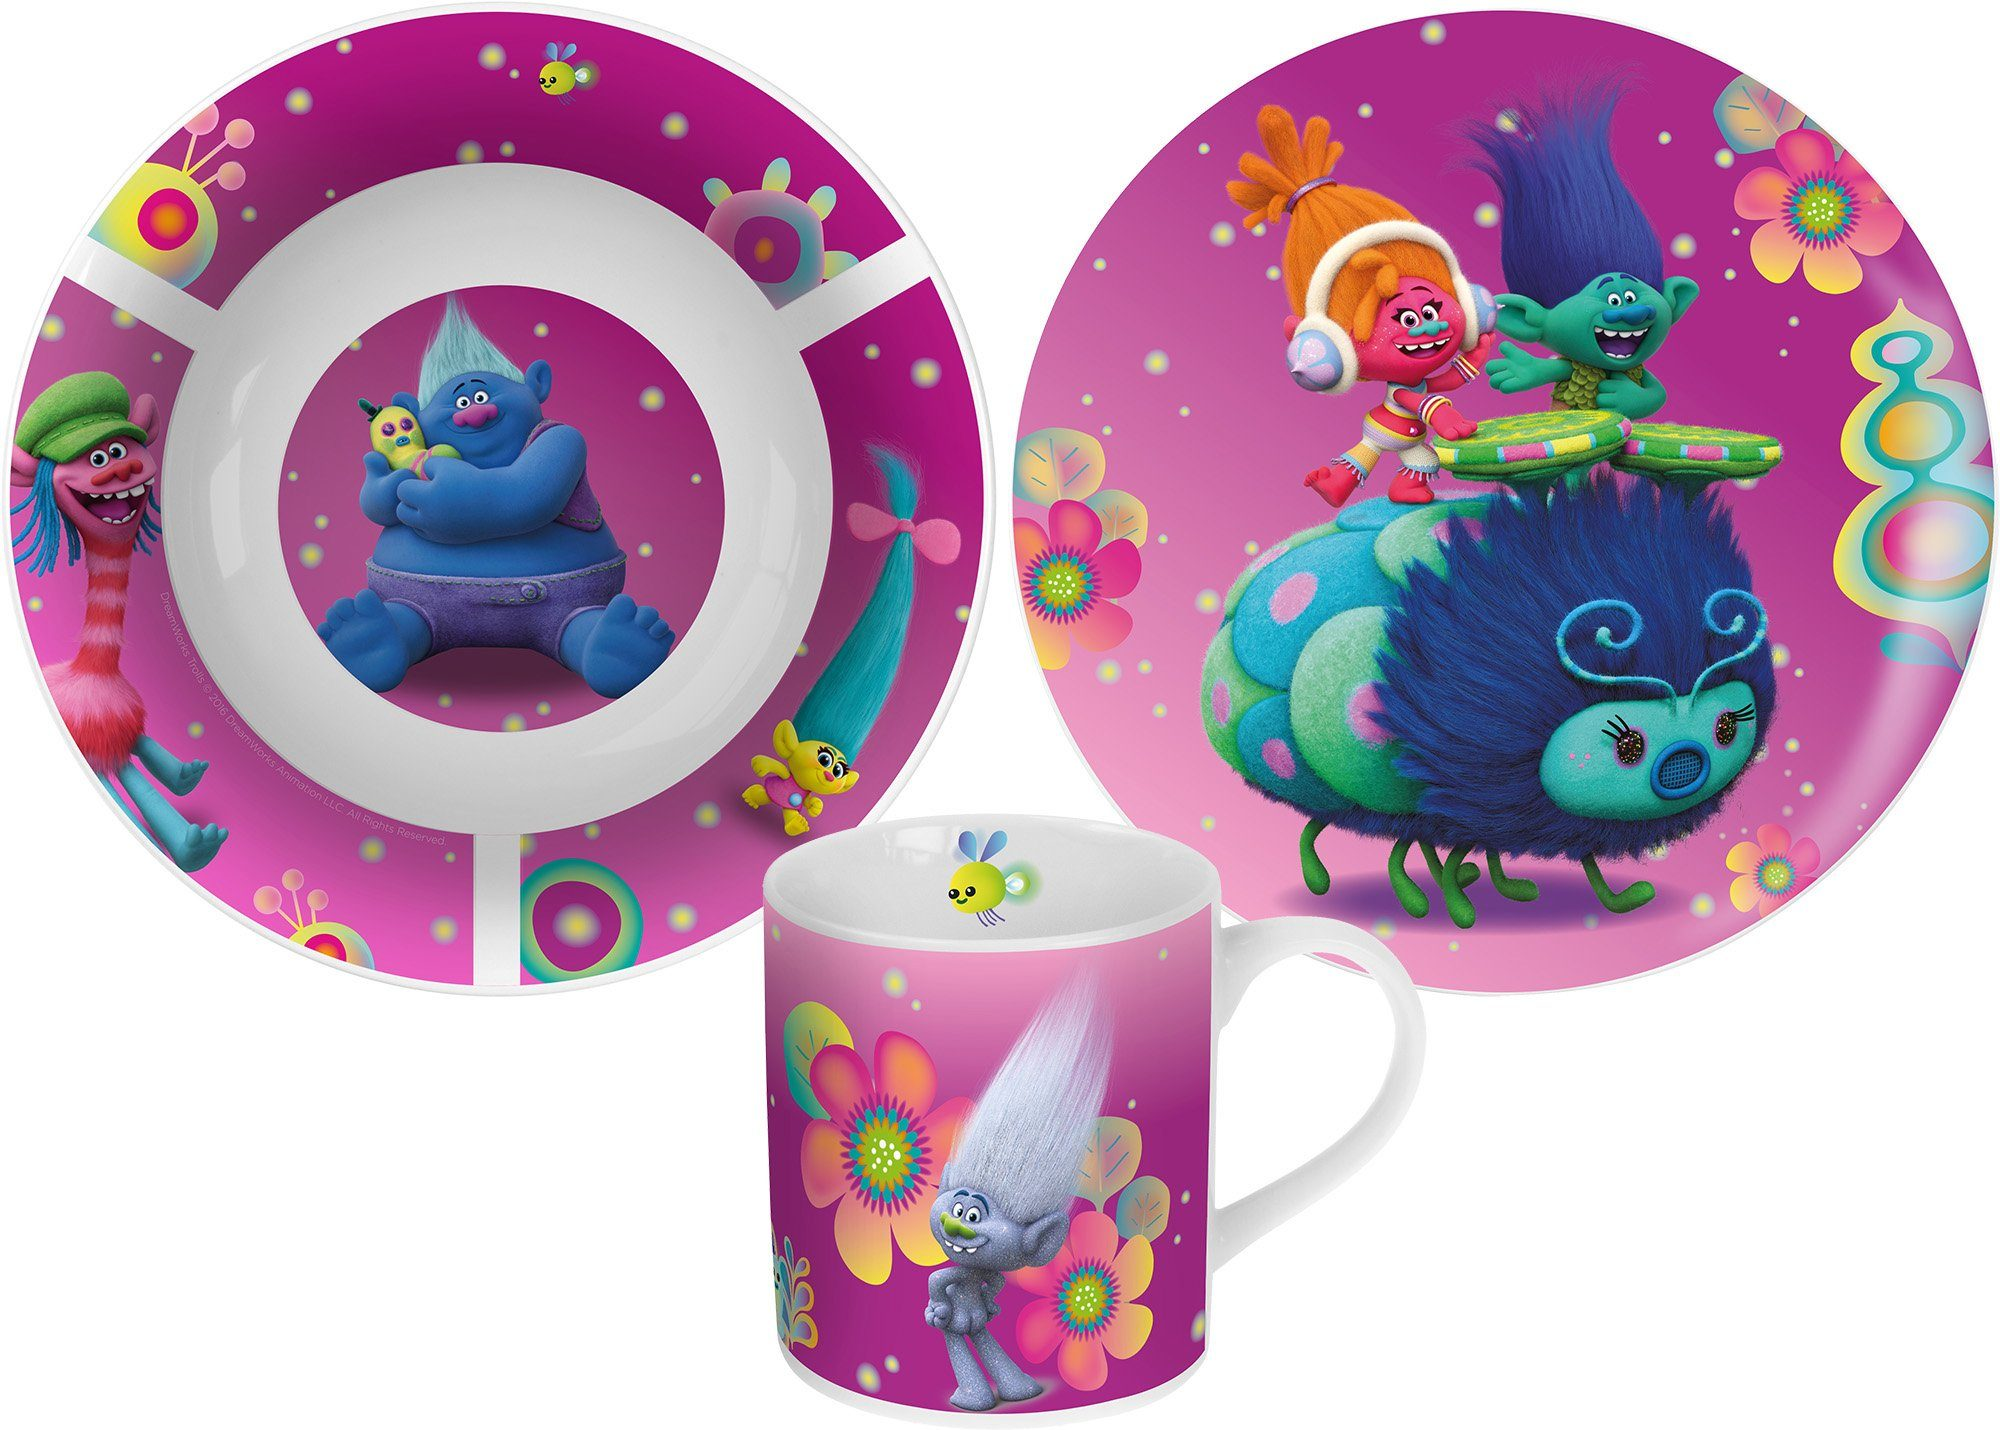 p:os Kindergeschirrset, »DreamWorks Trolls Keramikset«